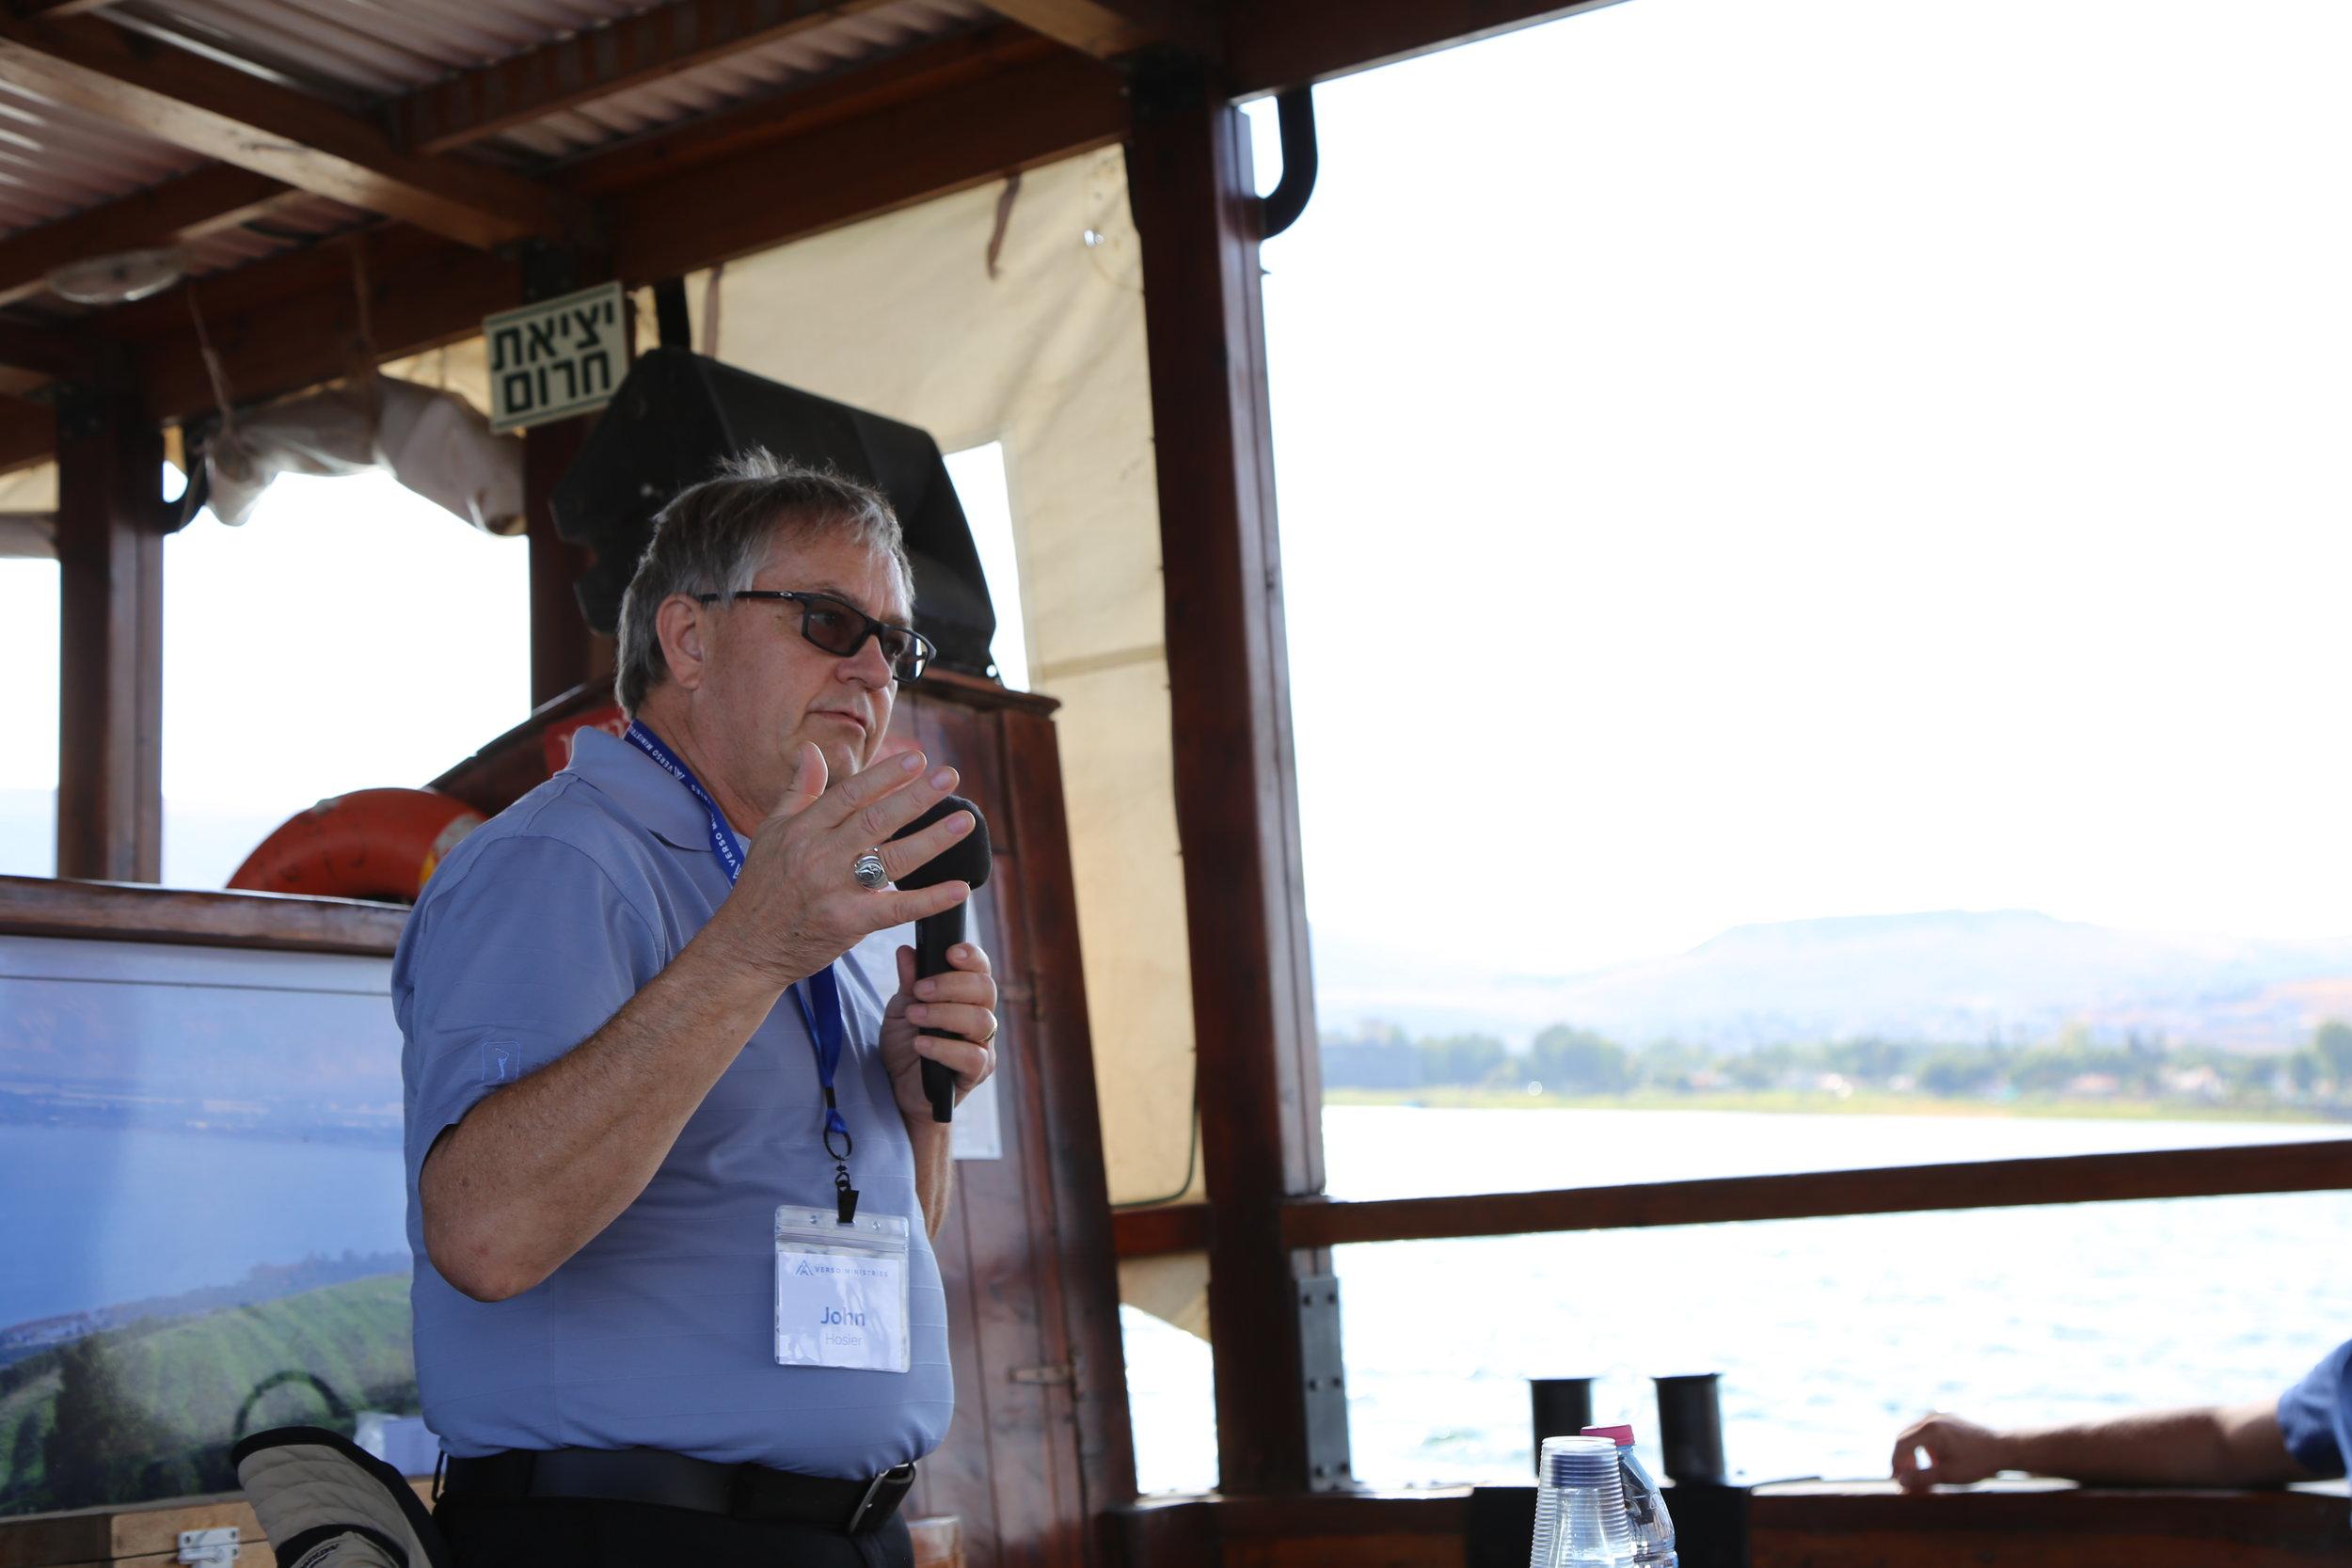 Deacon John preaching on the Sea of Galilee